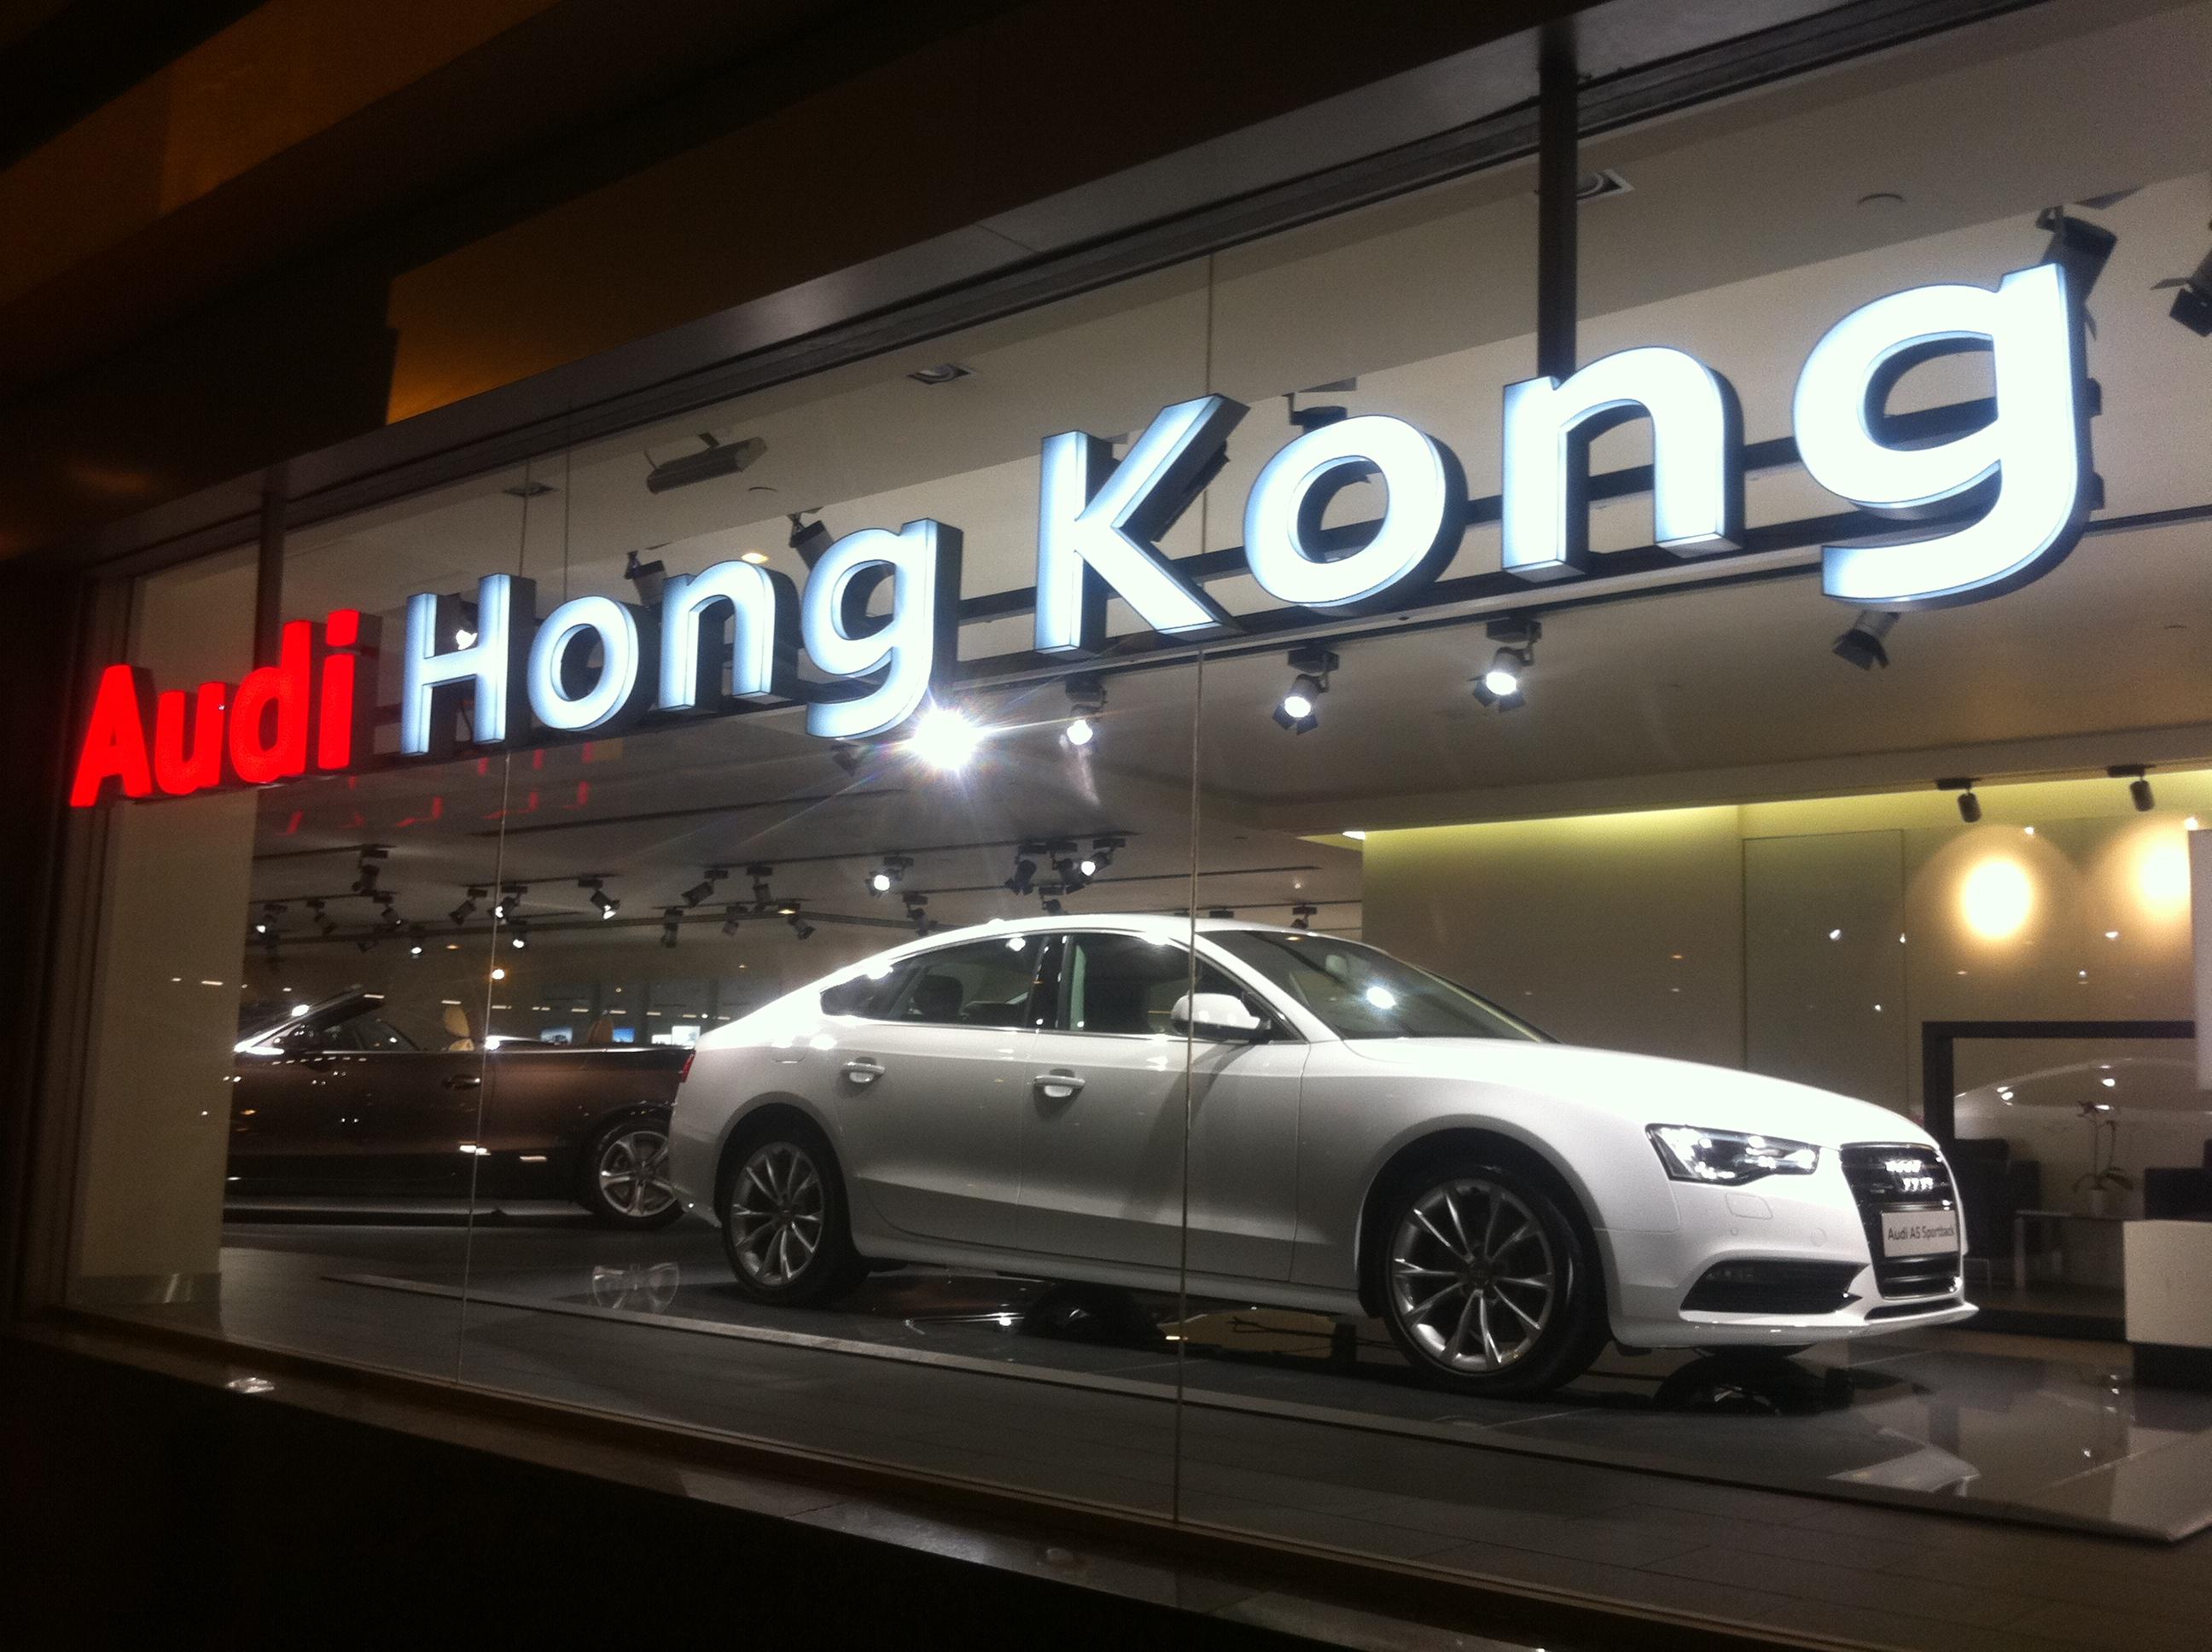 File Hk Admiralty Night 夏慤道 Harcourt Road Shop Audi Hong Kong Name Sign Showroom Feb 2012 Jpg